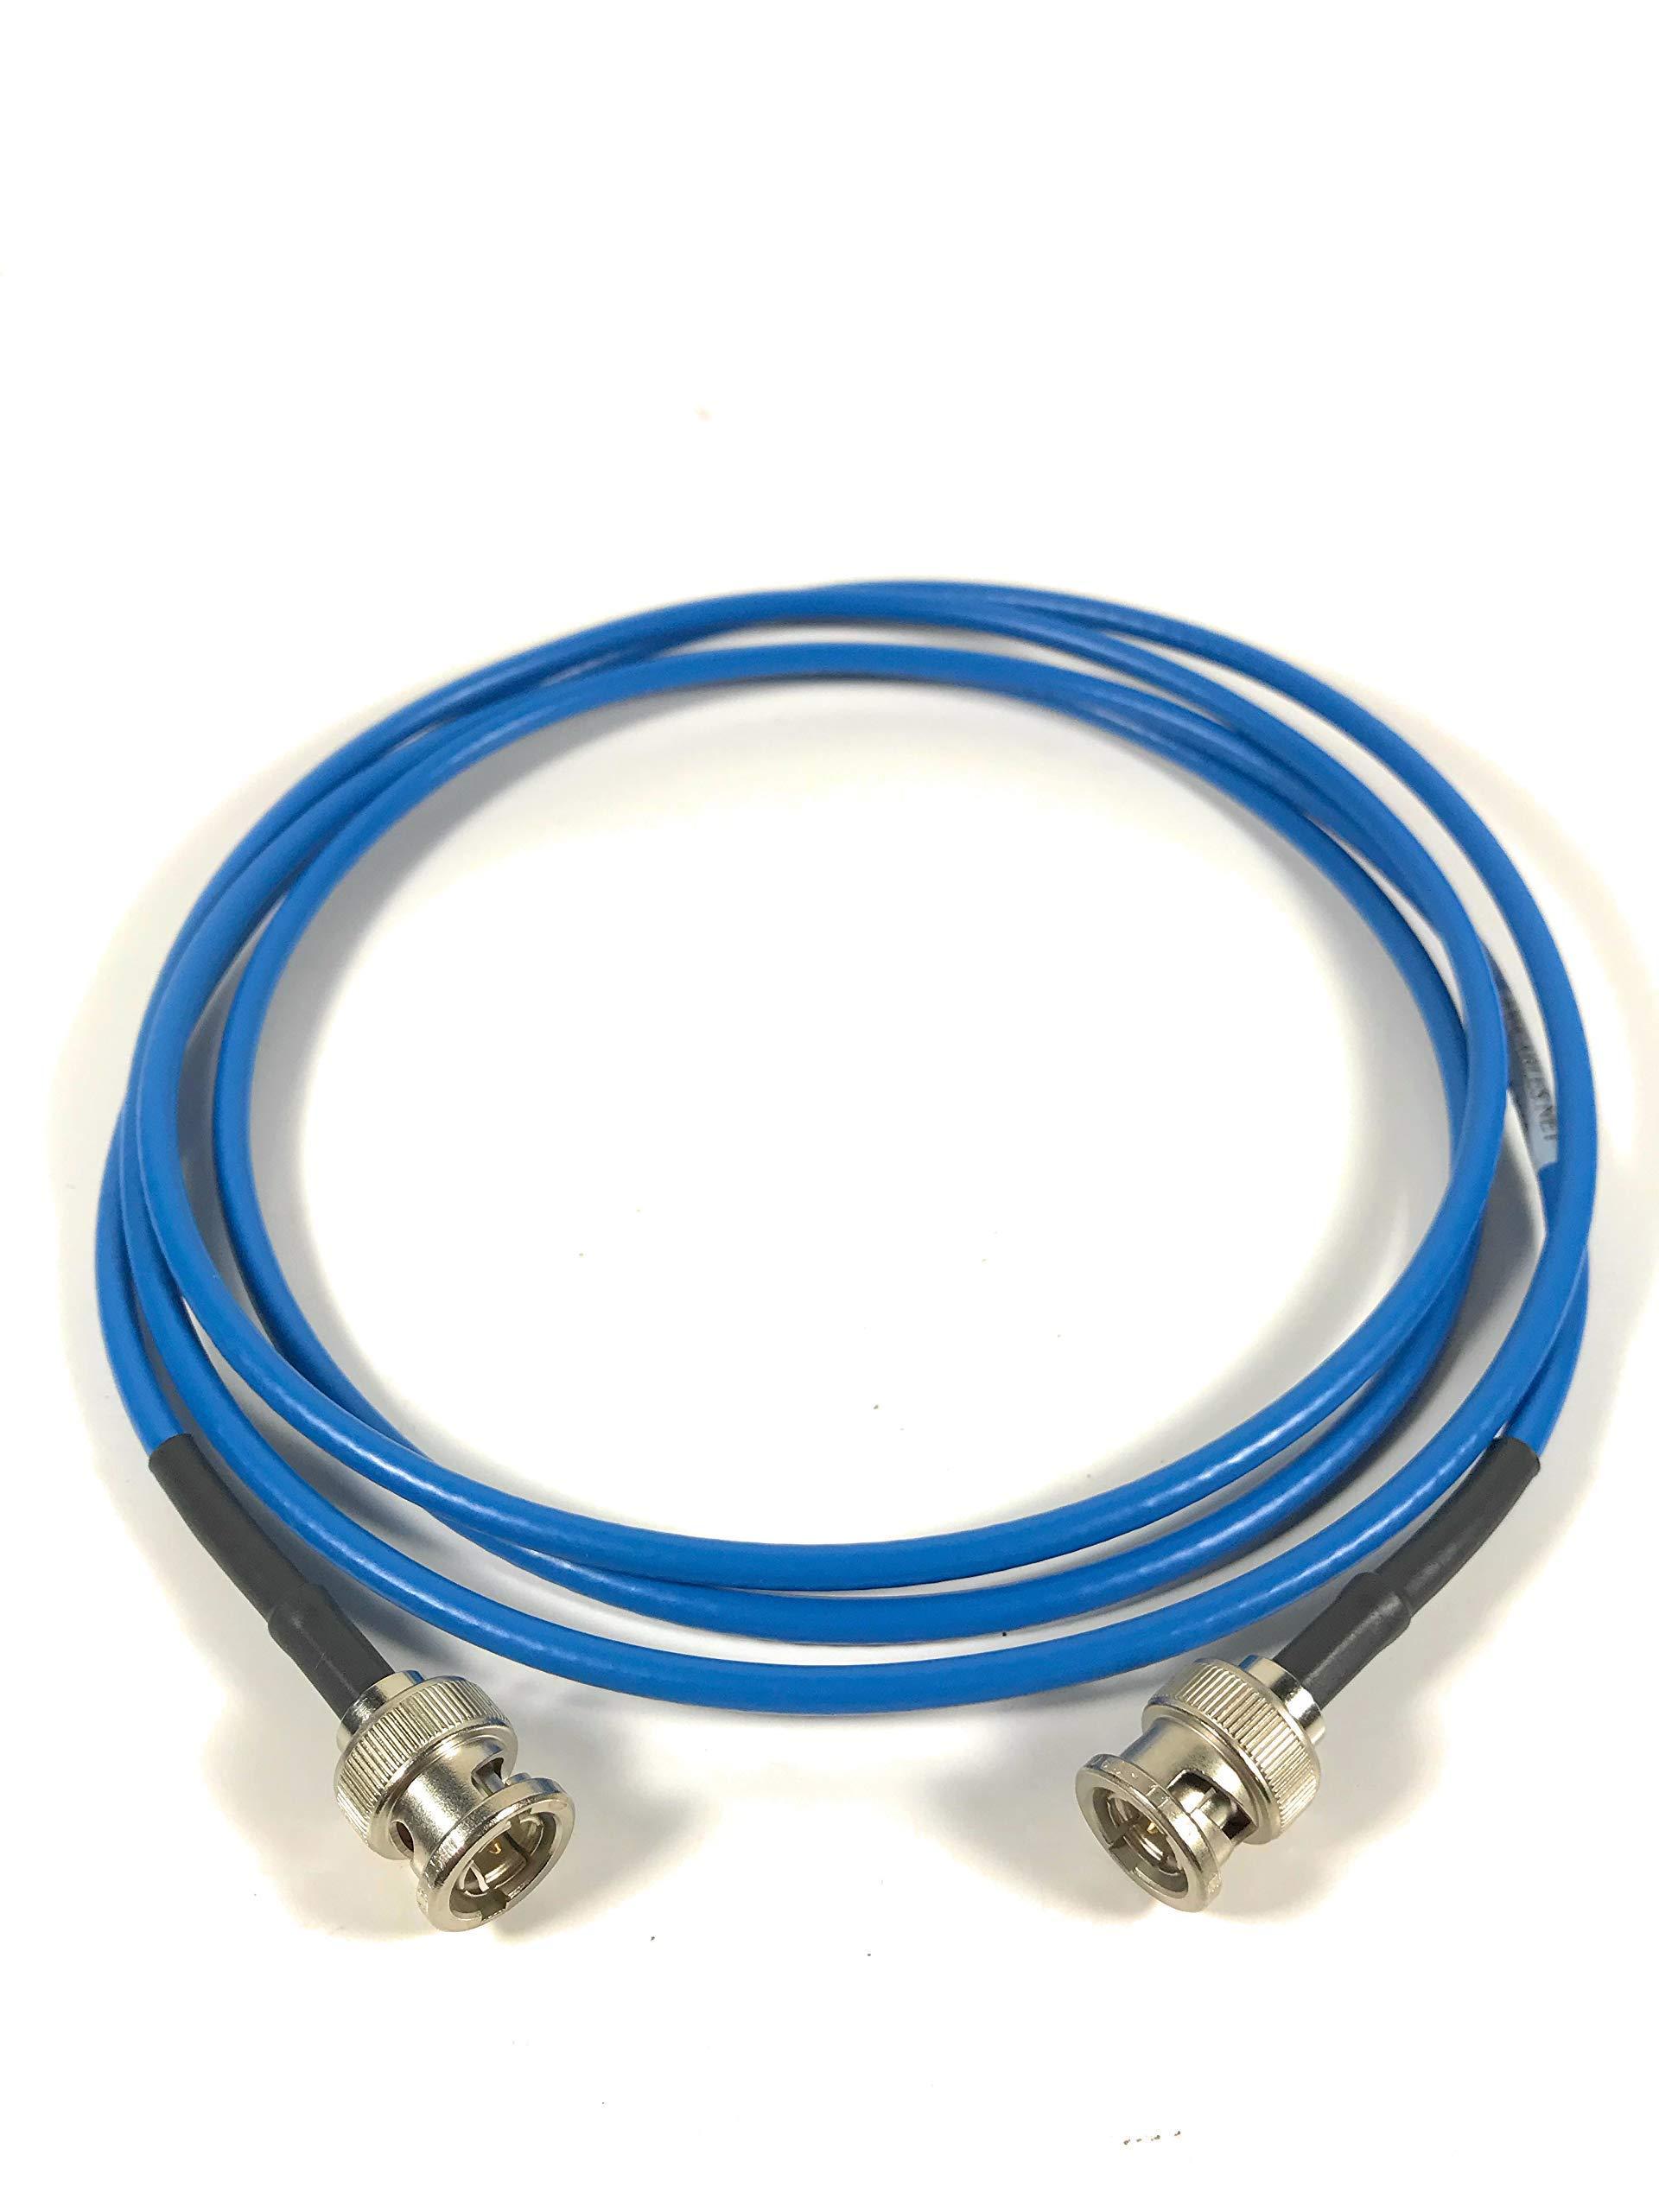 150ft AV-Cables 3G/6G HD SDI Mini RG59 BNC Belden 1855a Cable - Blue by AV-Cables